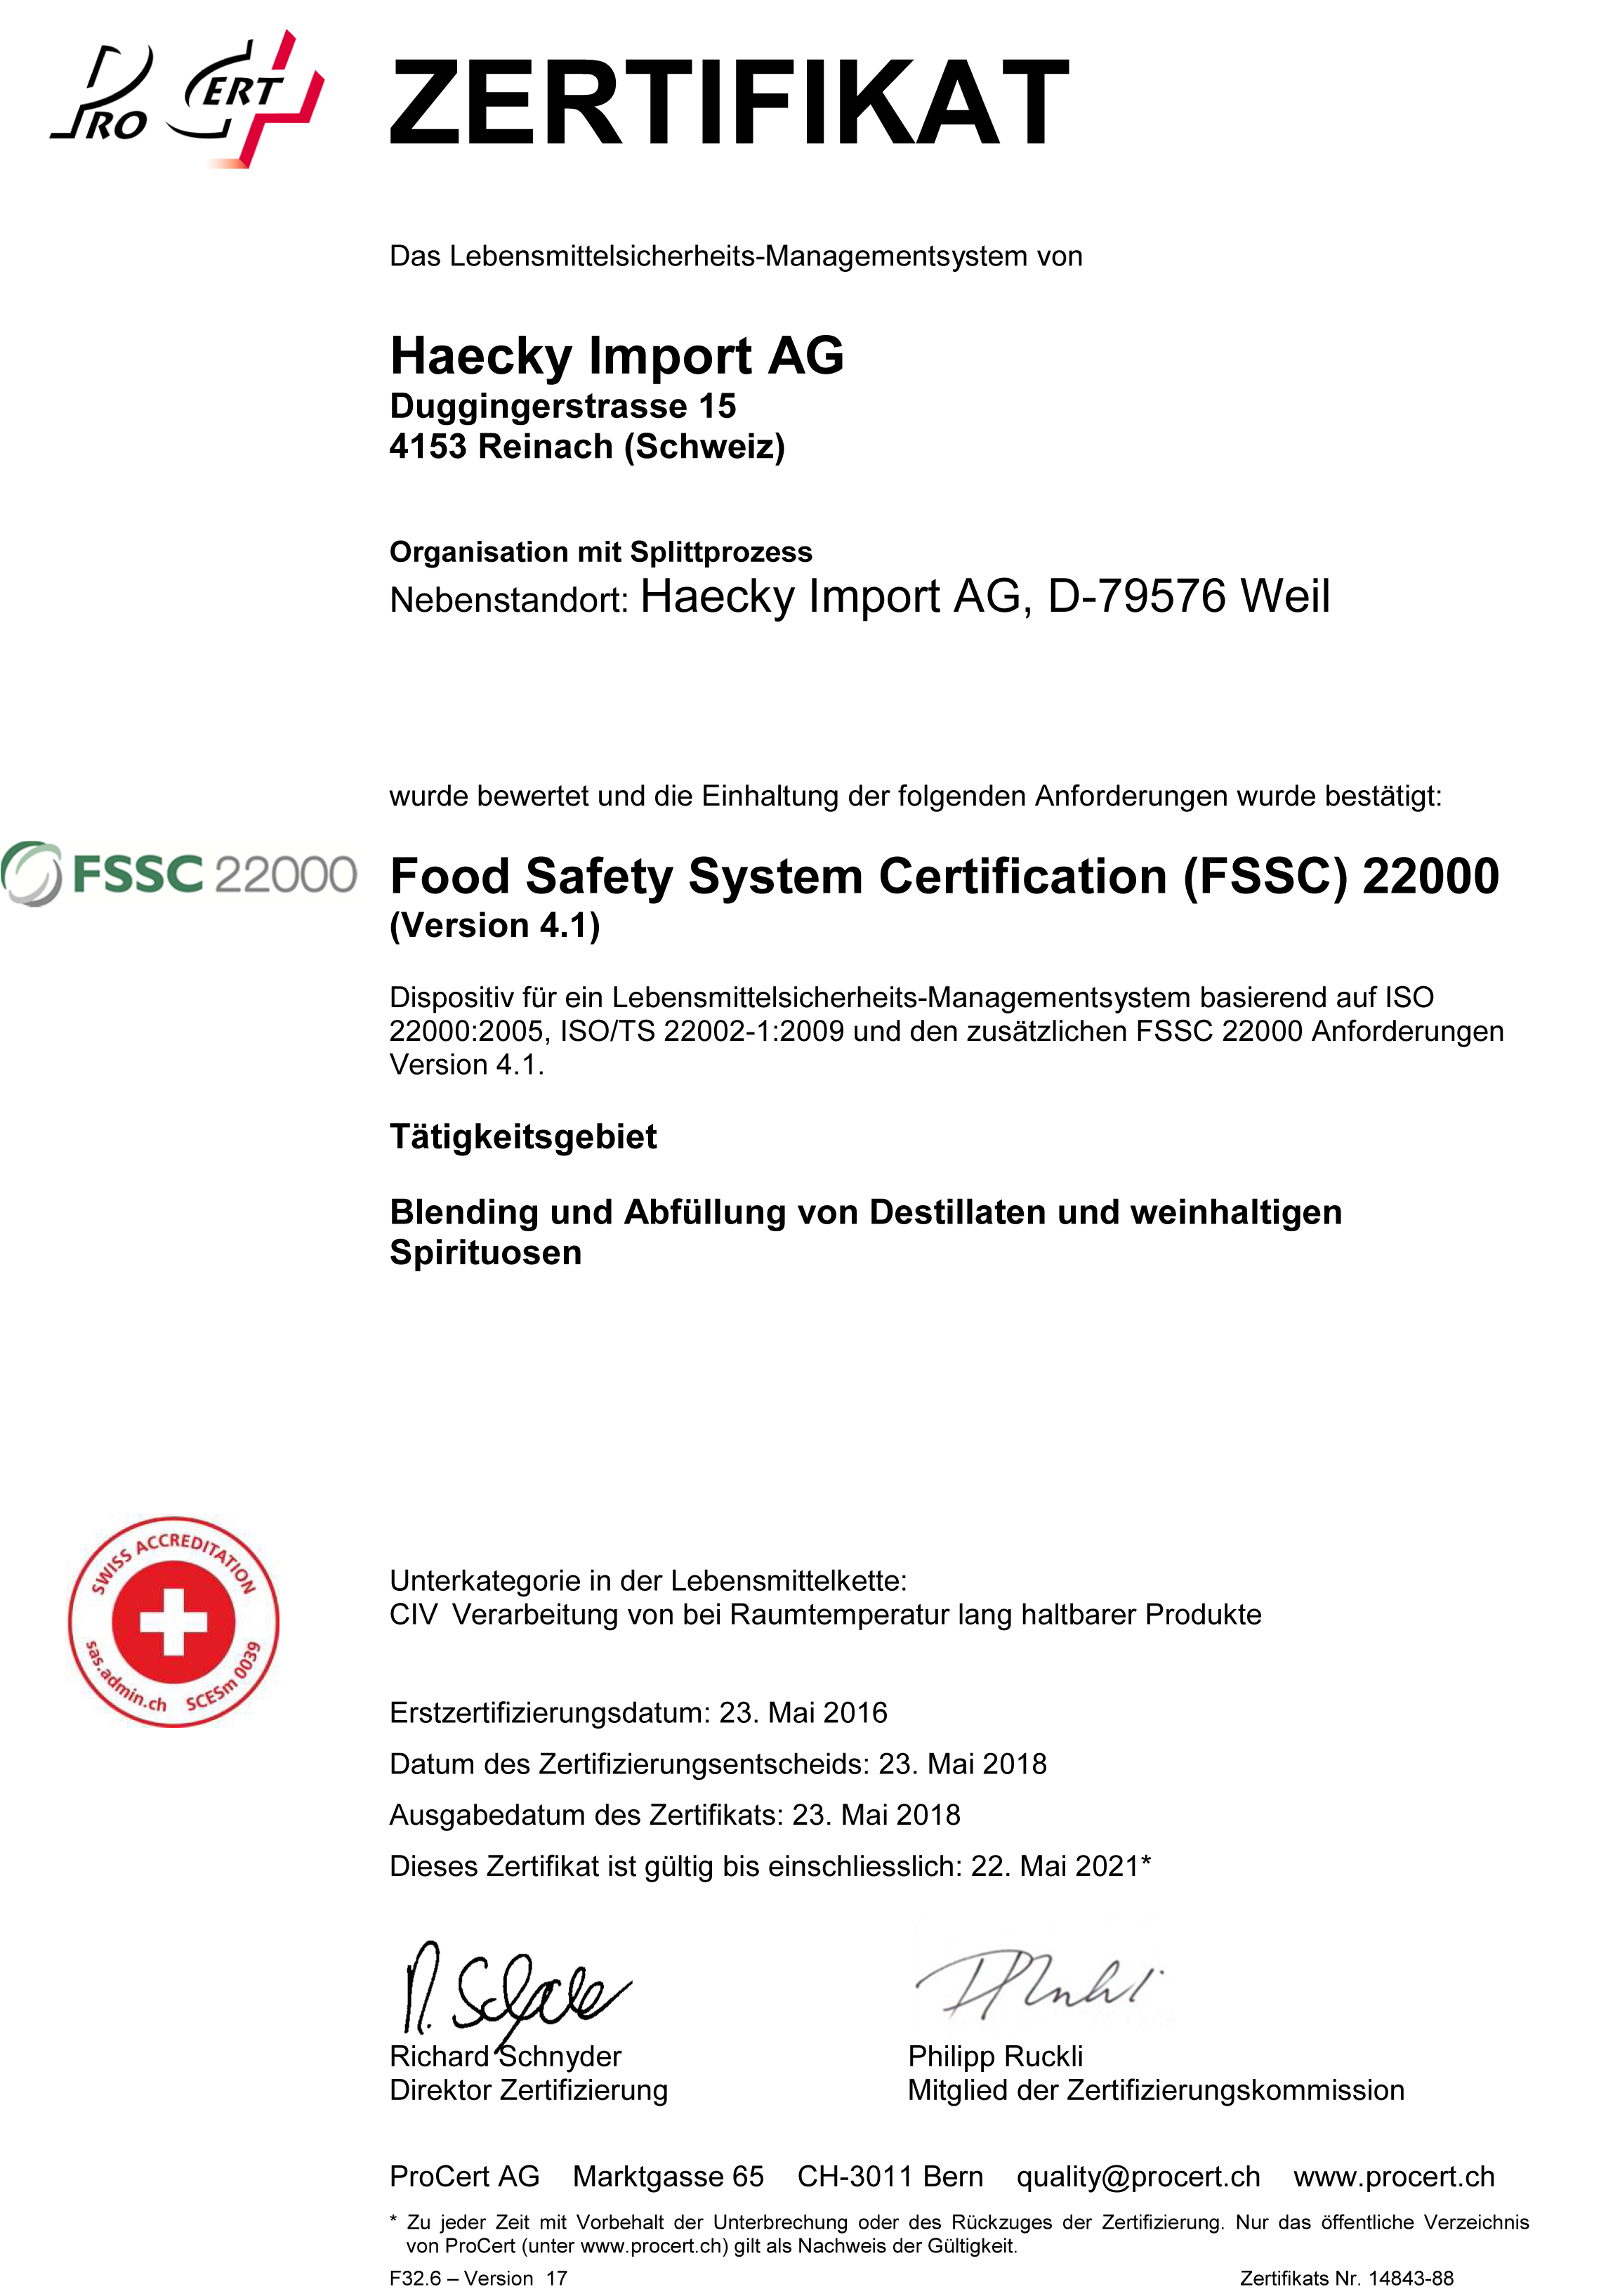 Certificates - Haecky